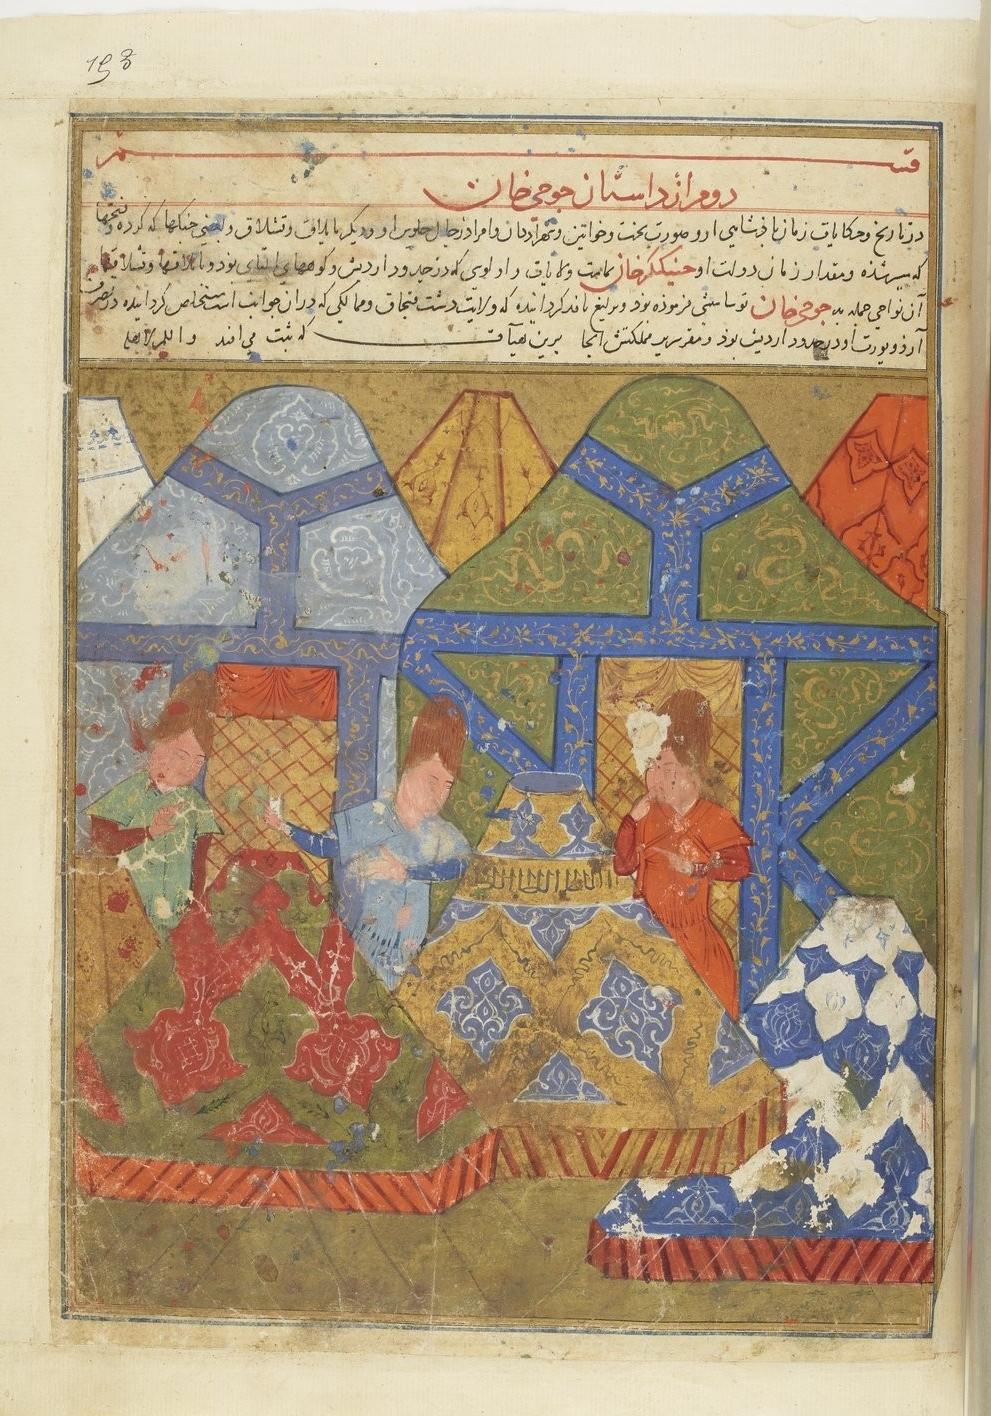 Folio from  Jami al-Tawarikh  Bibliothèque Nationale de France, c. 1430-1434